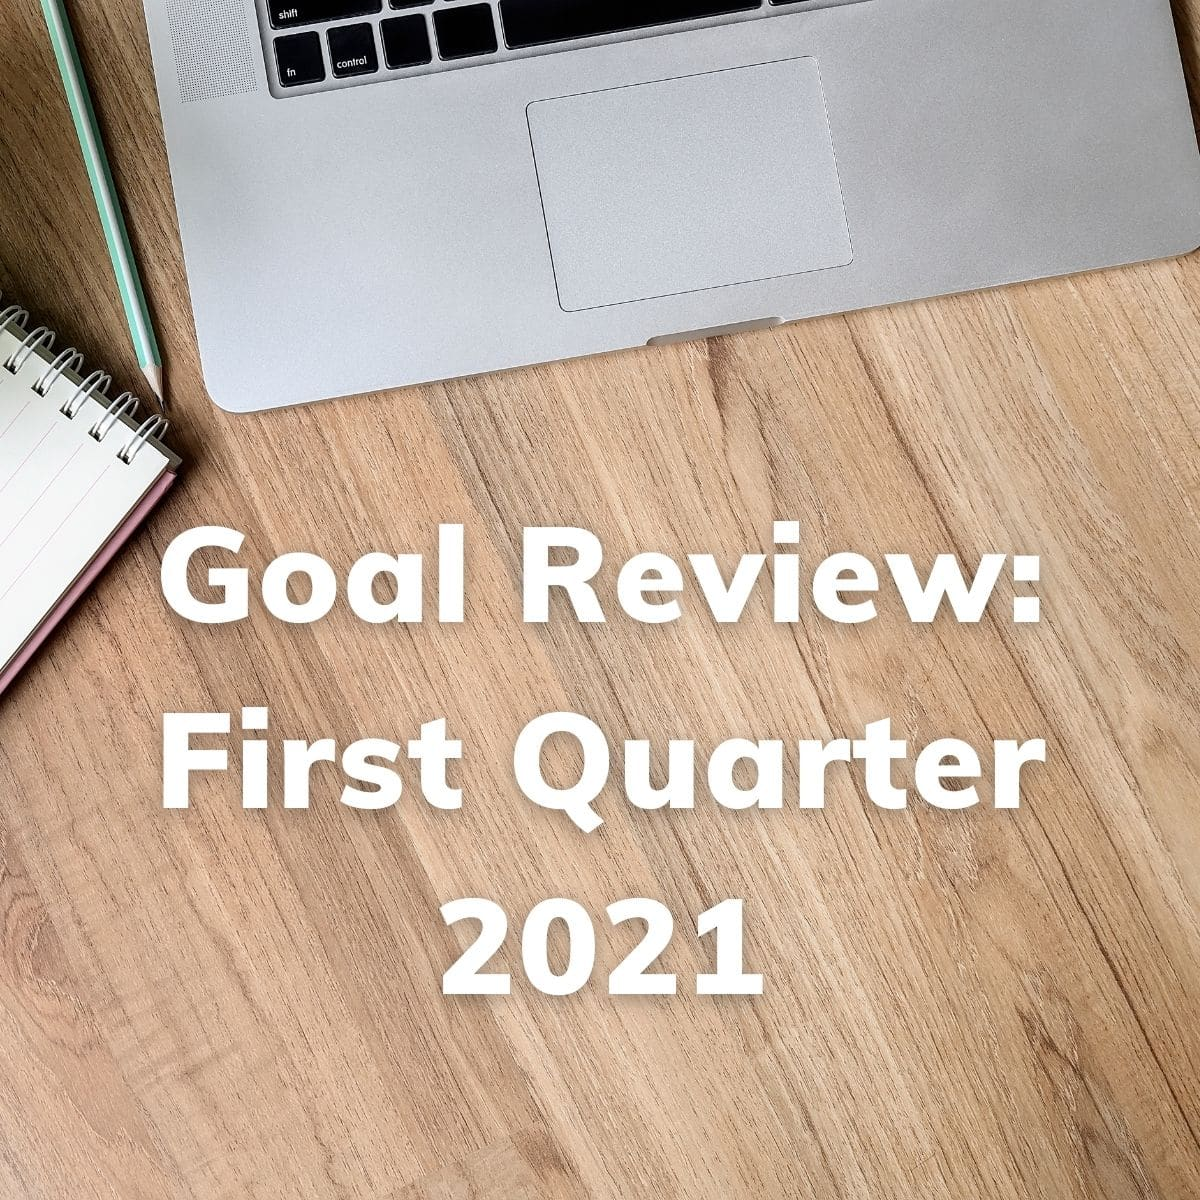 Goal Review - First Quarter 2021